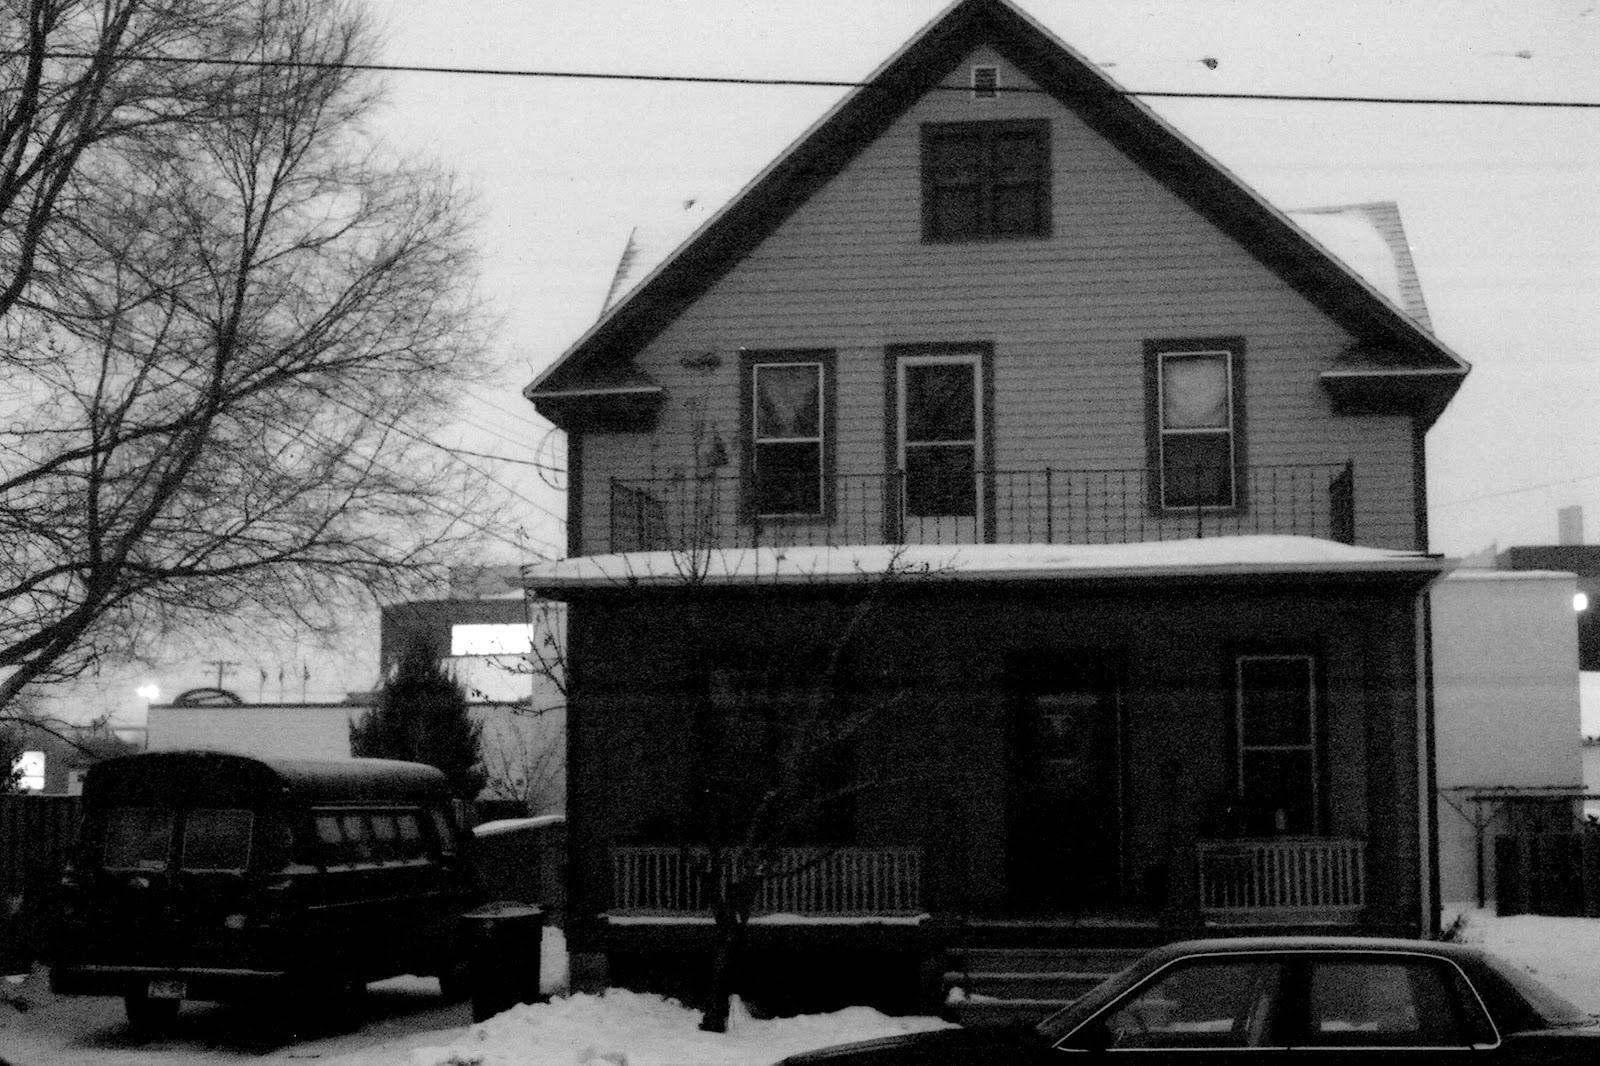 The BFG House